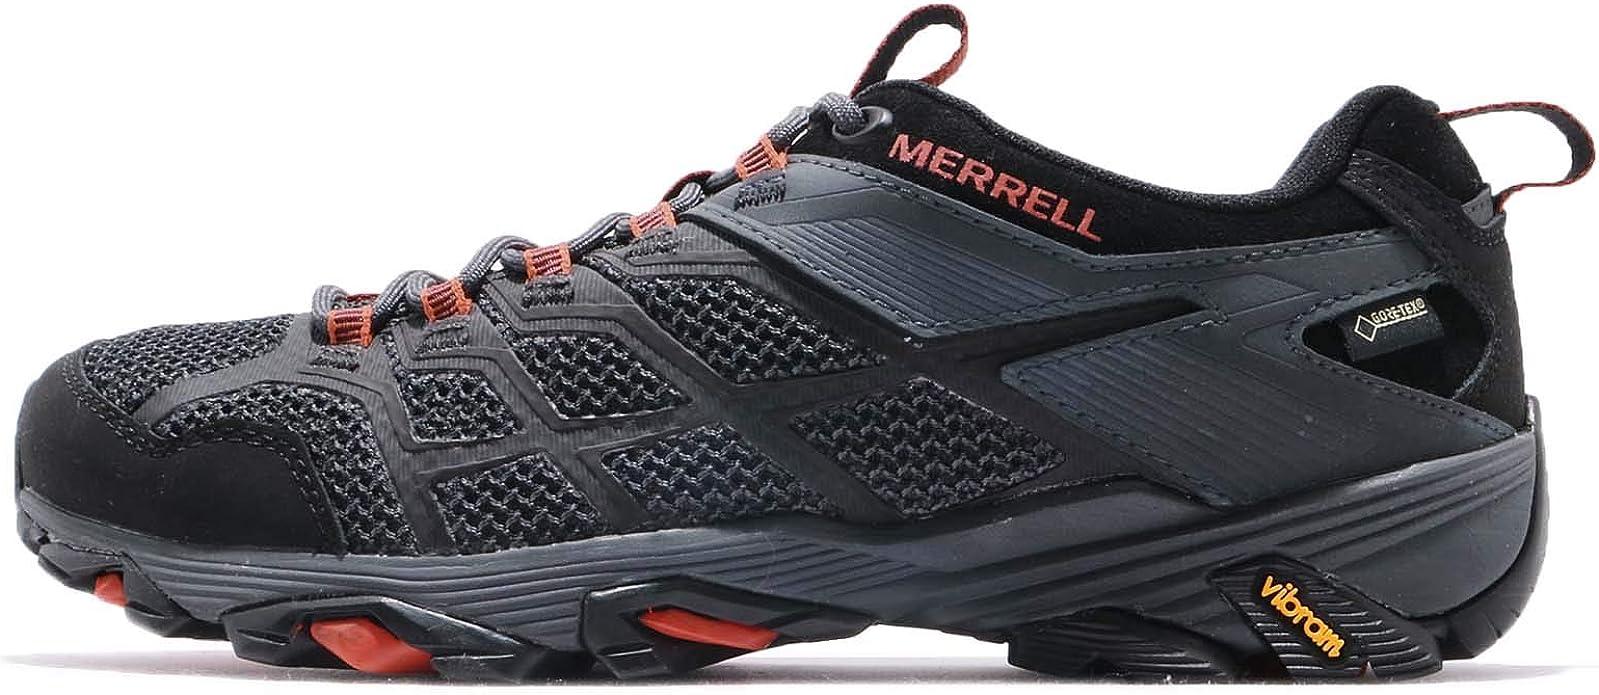 merrell chaussure moab fst gore-tex nike